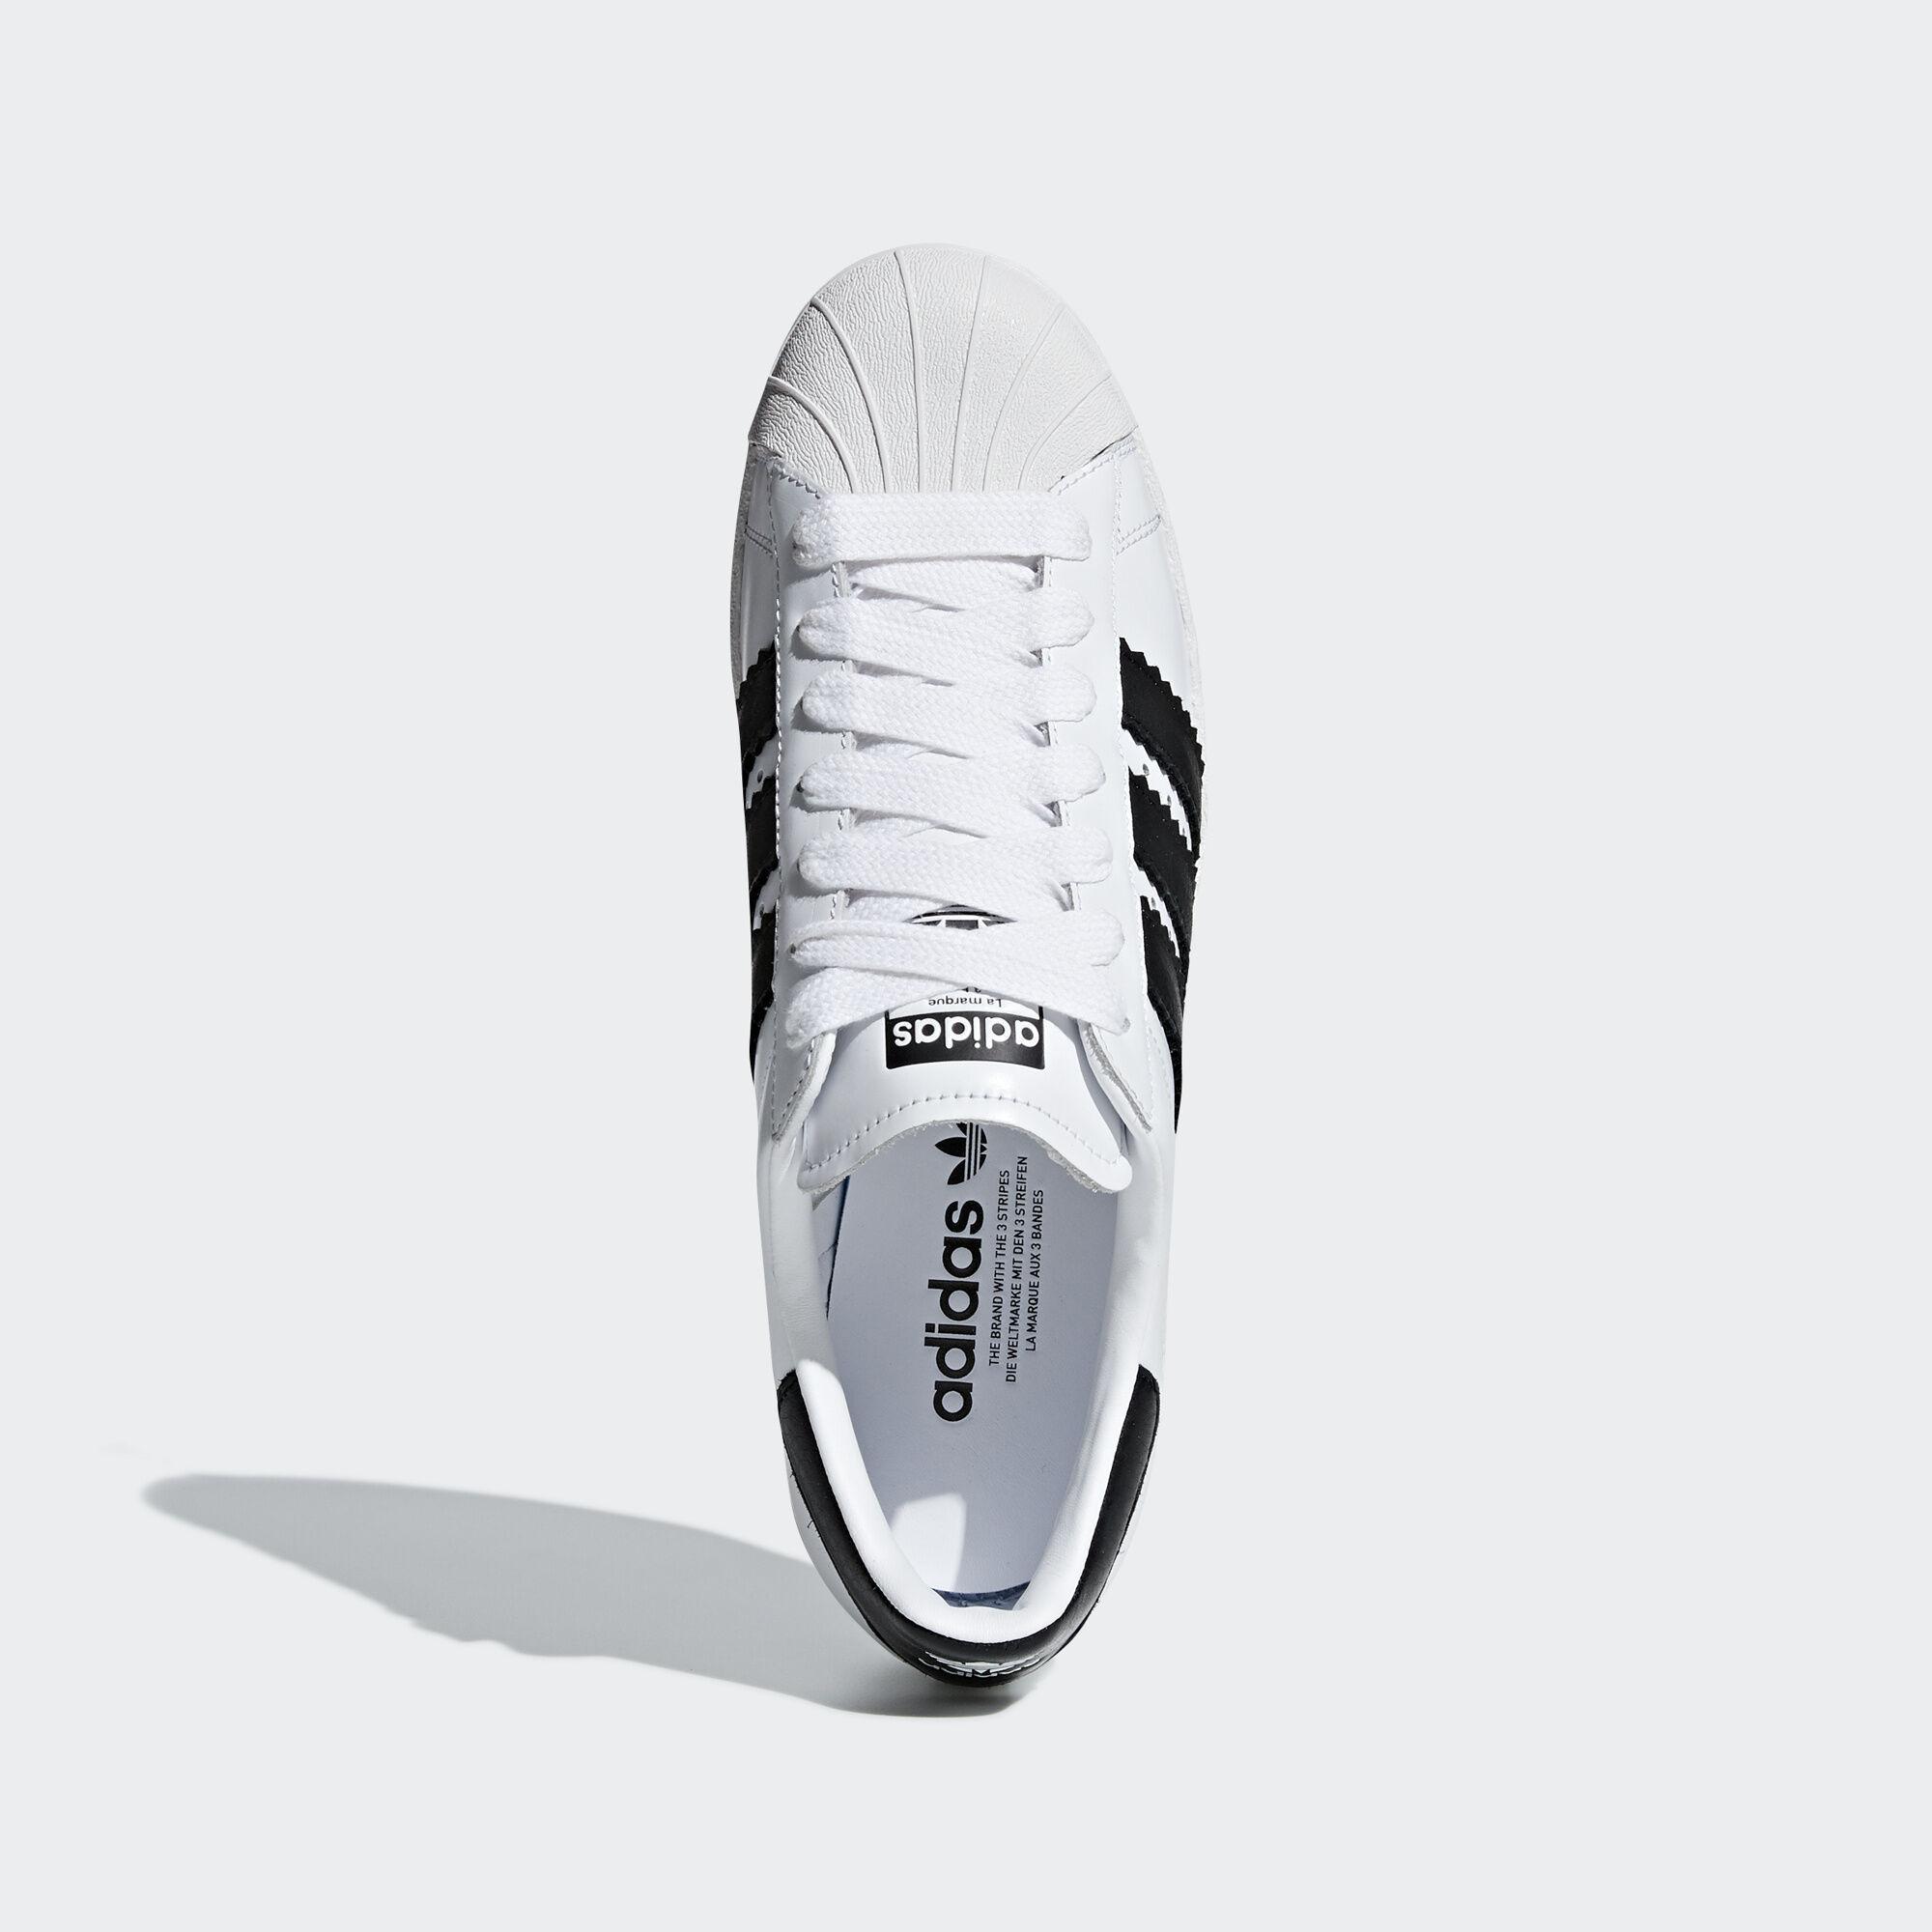 Adidas Superstar 80S Ftw White/ Core Black/ Crystal White adidas Originals